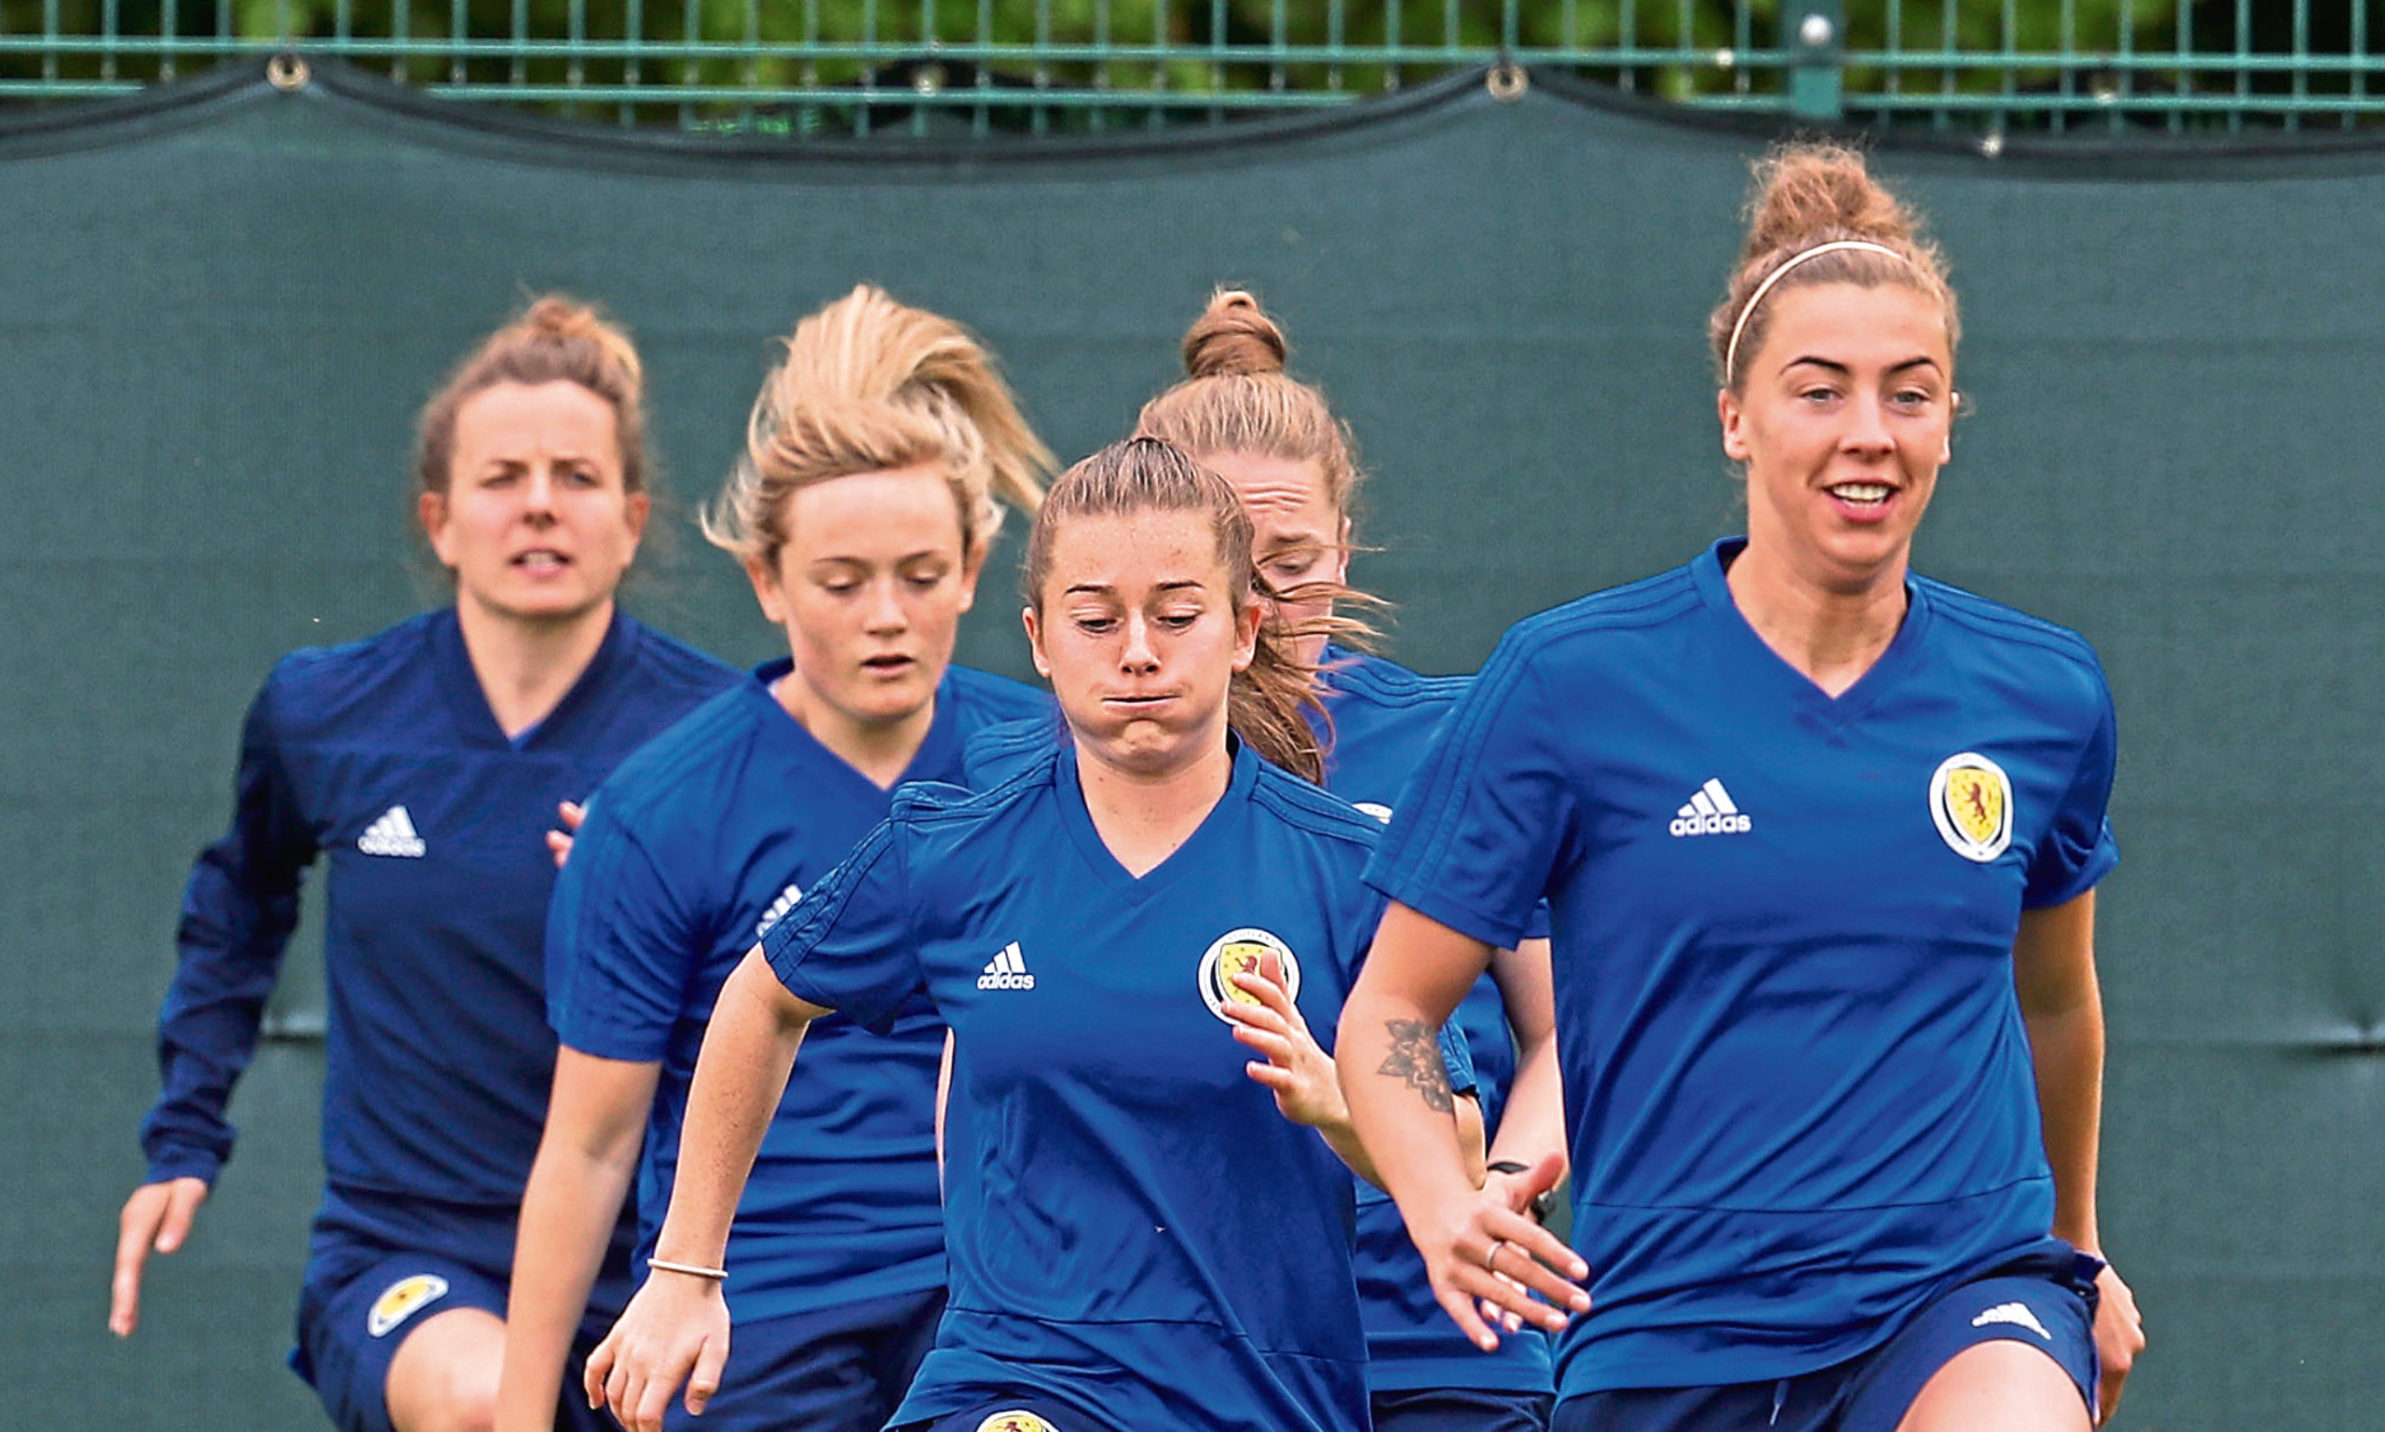 Scotland players during the training session at Oriam, Edinburgh.